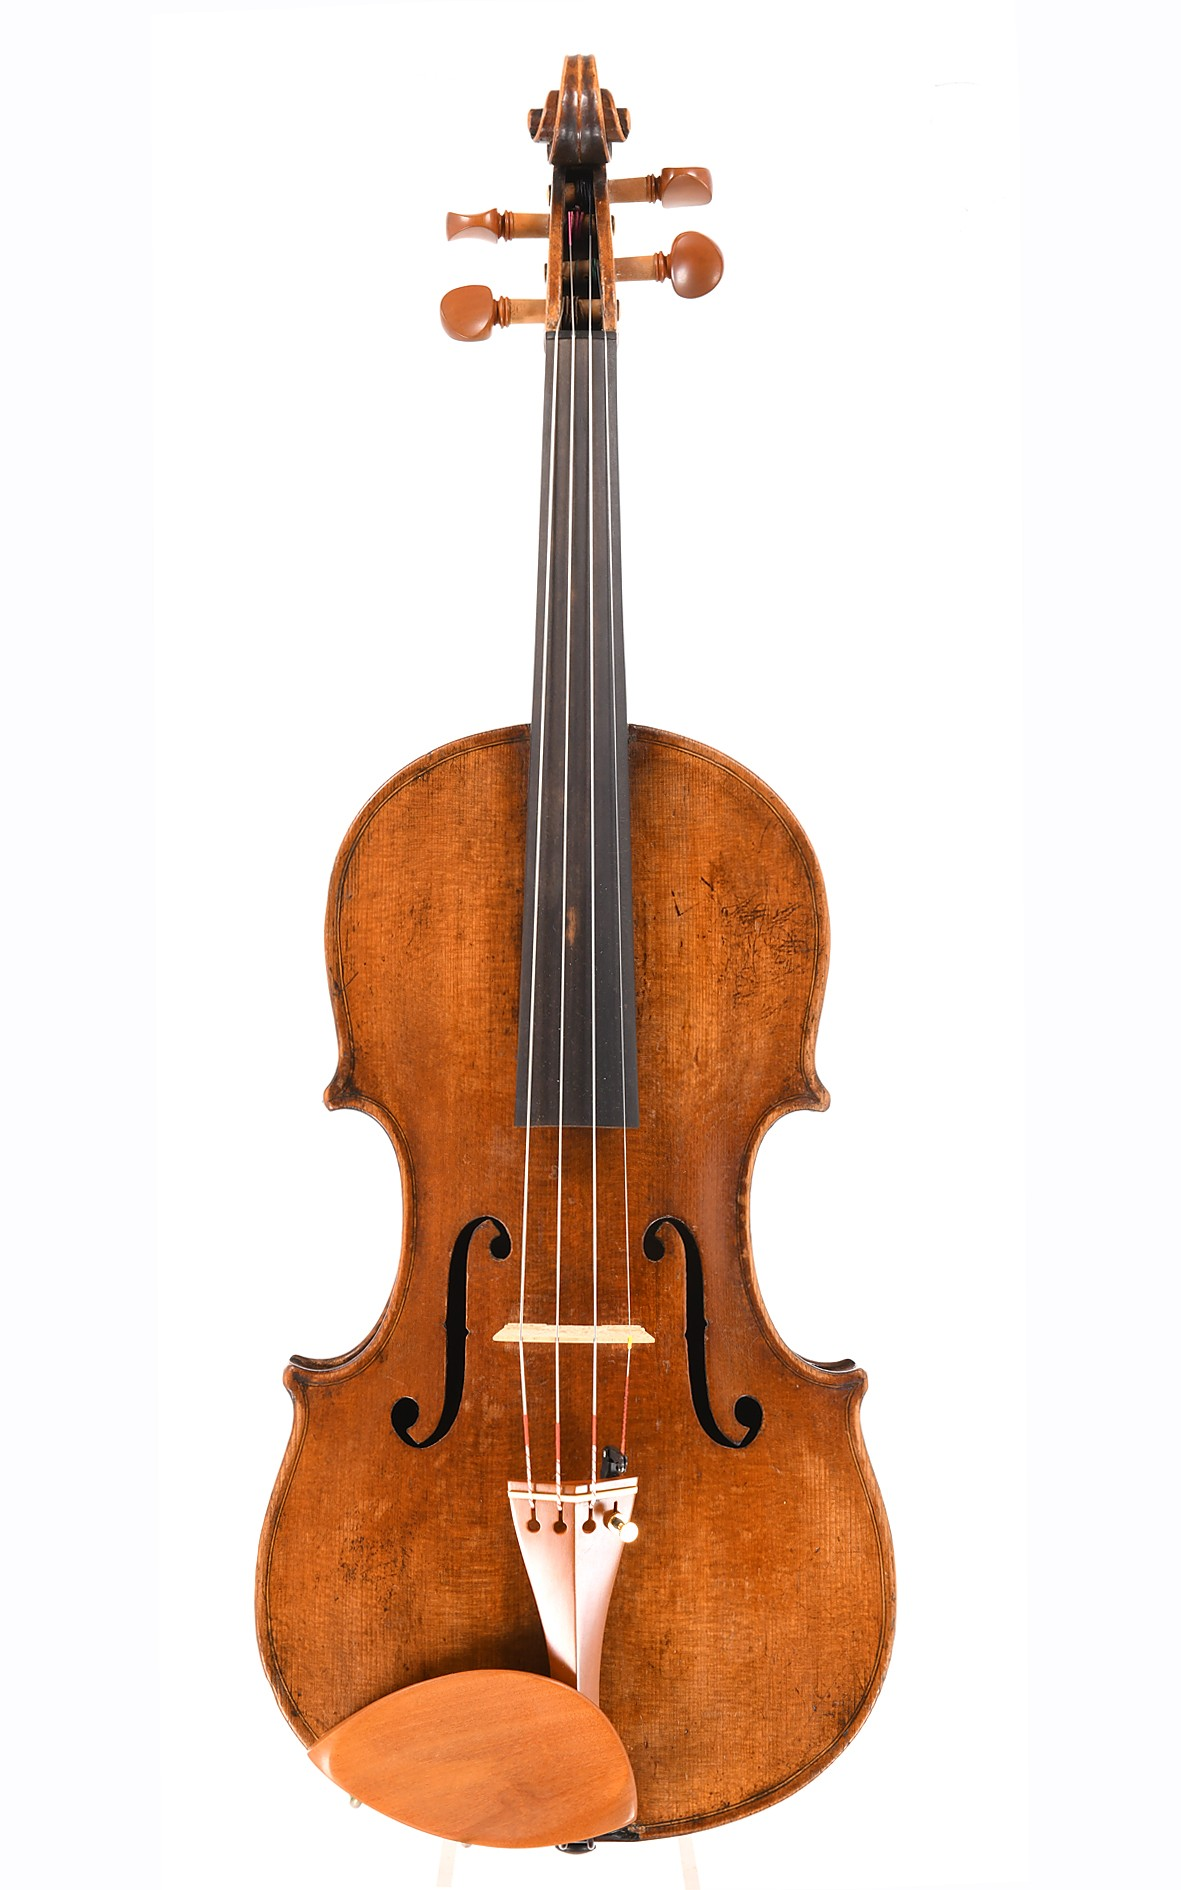 Antique violin from Saxony, after Antonio Stradivari - top